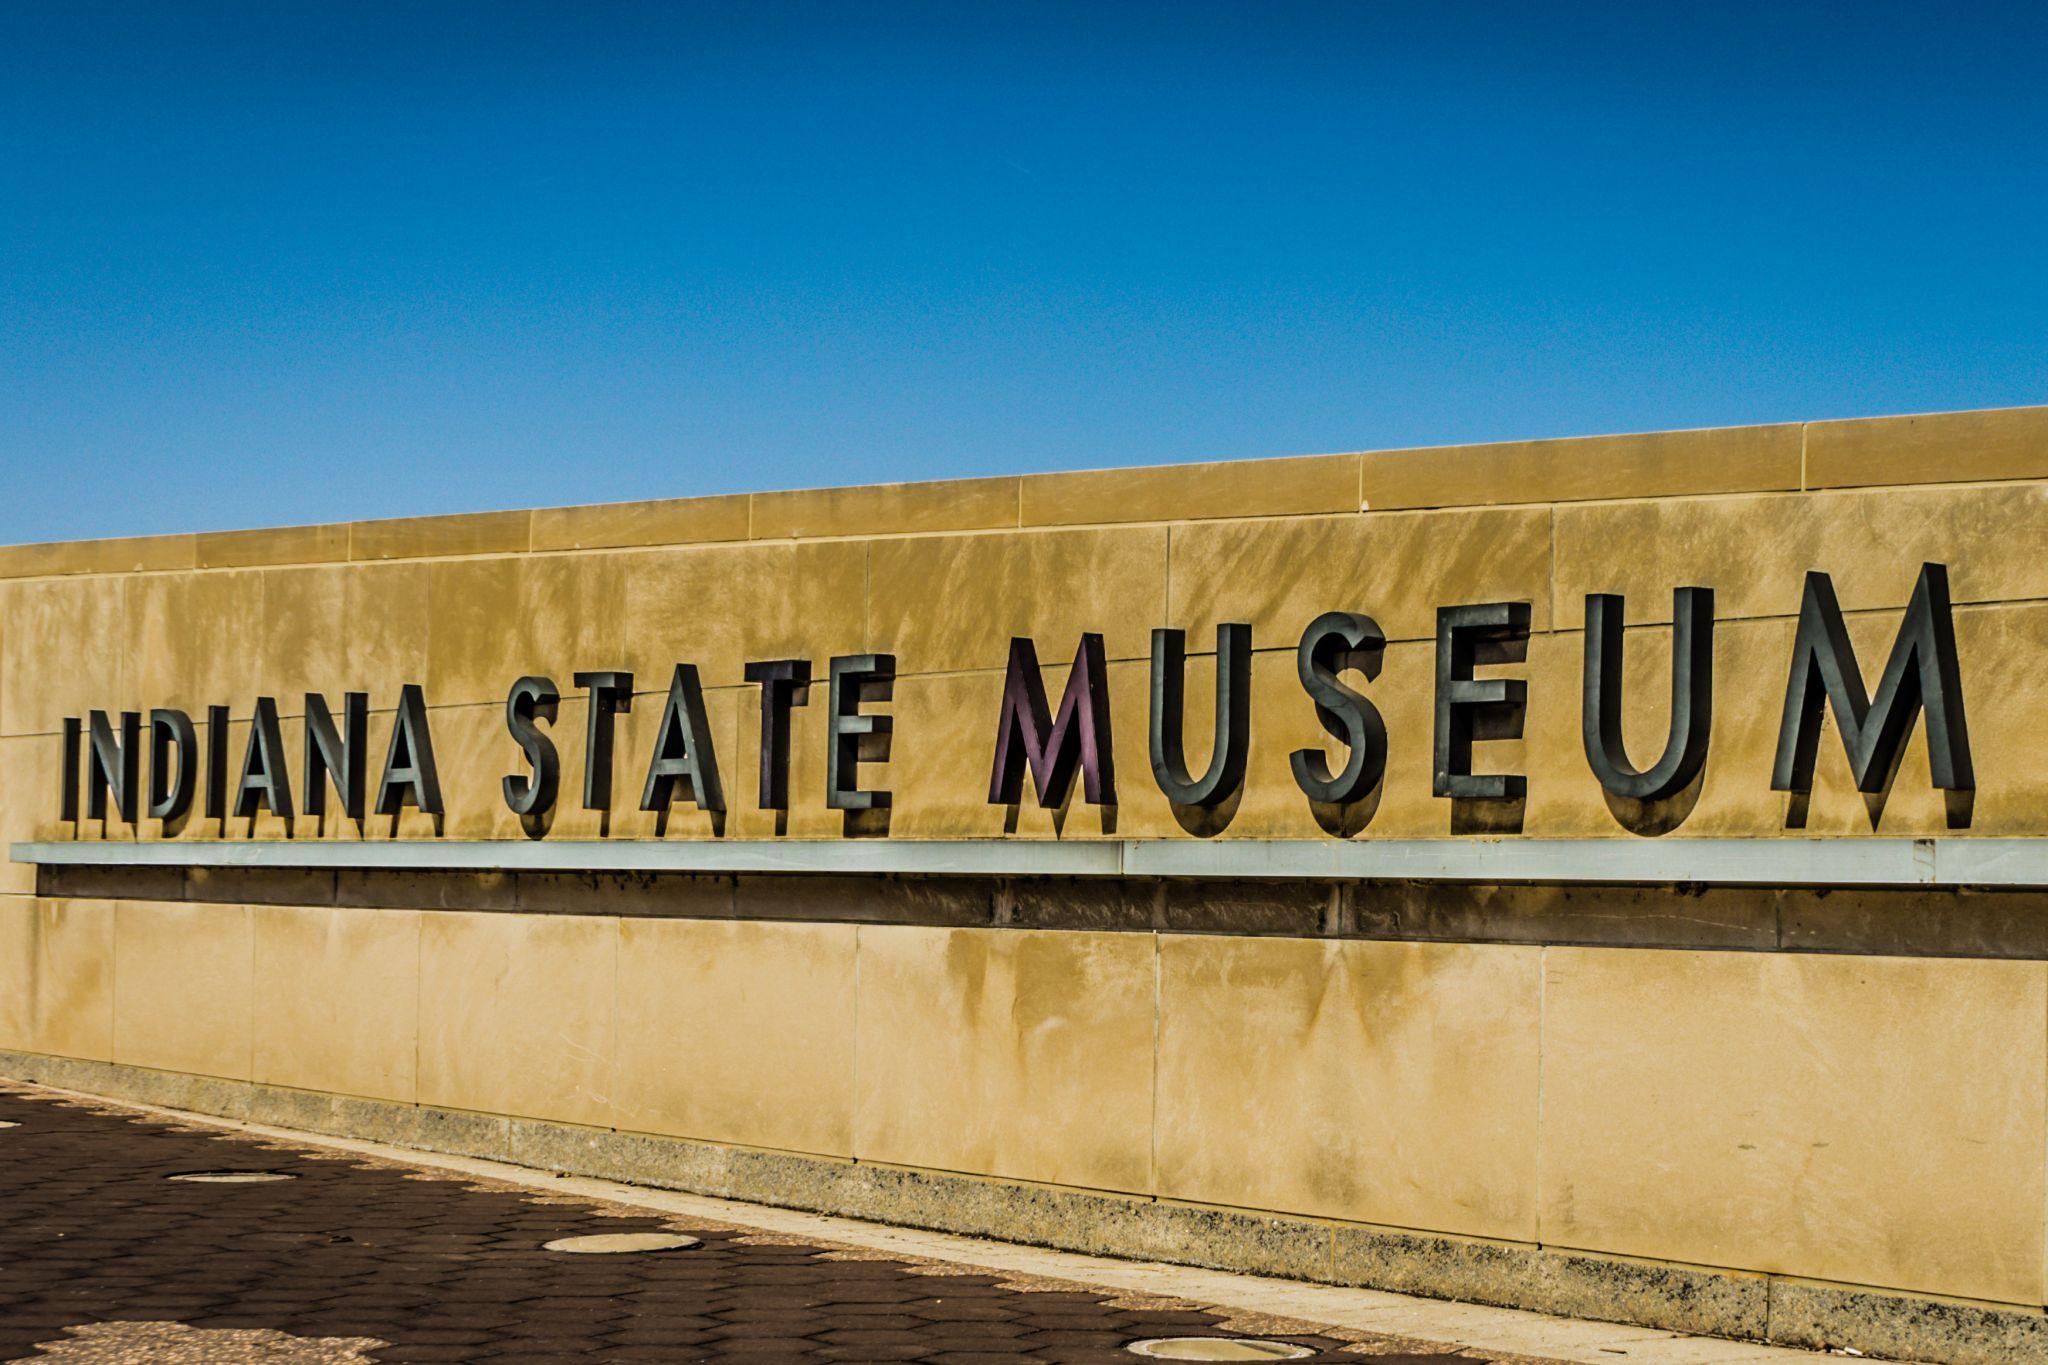 Indiana State Museum, USA